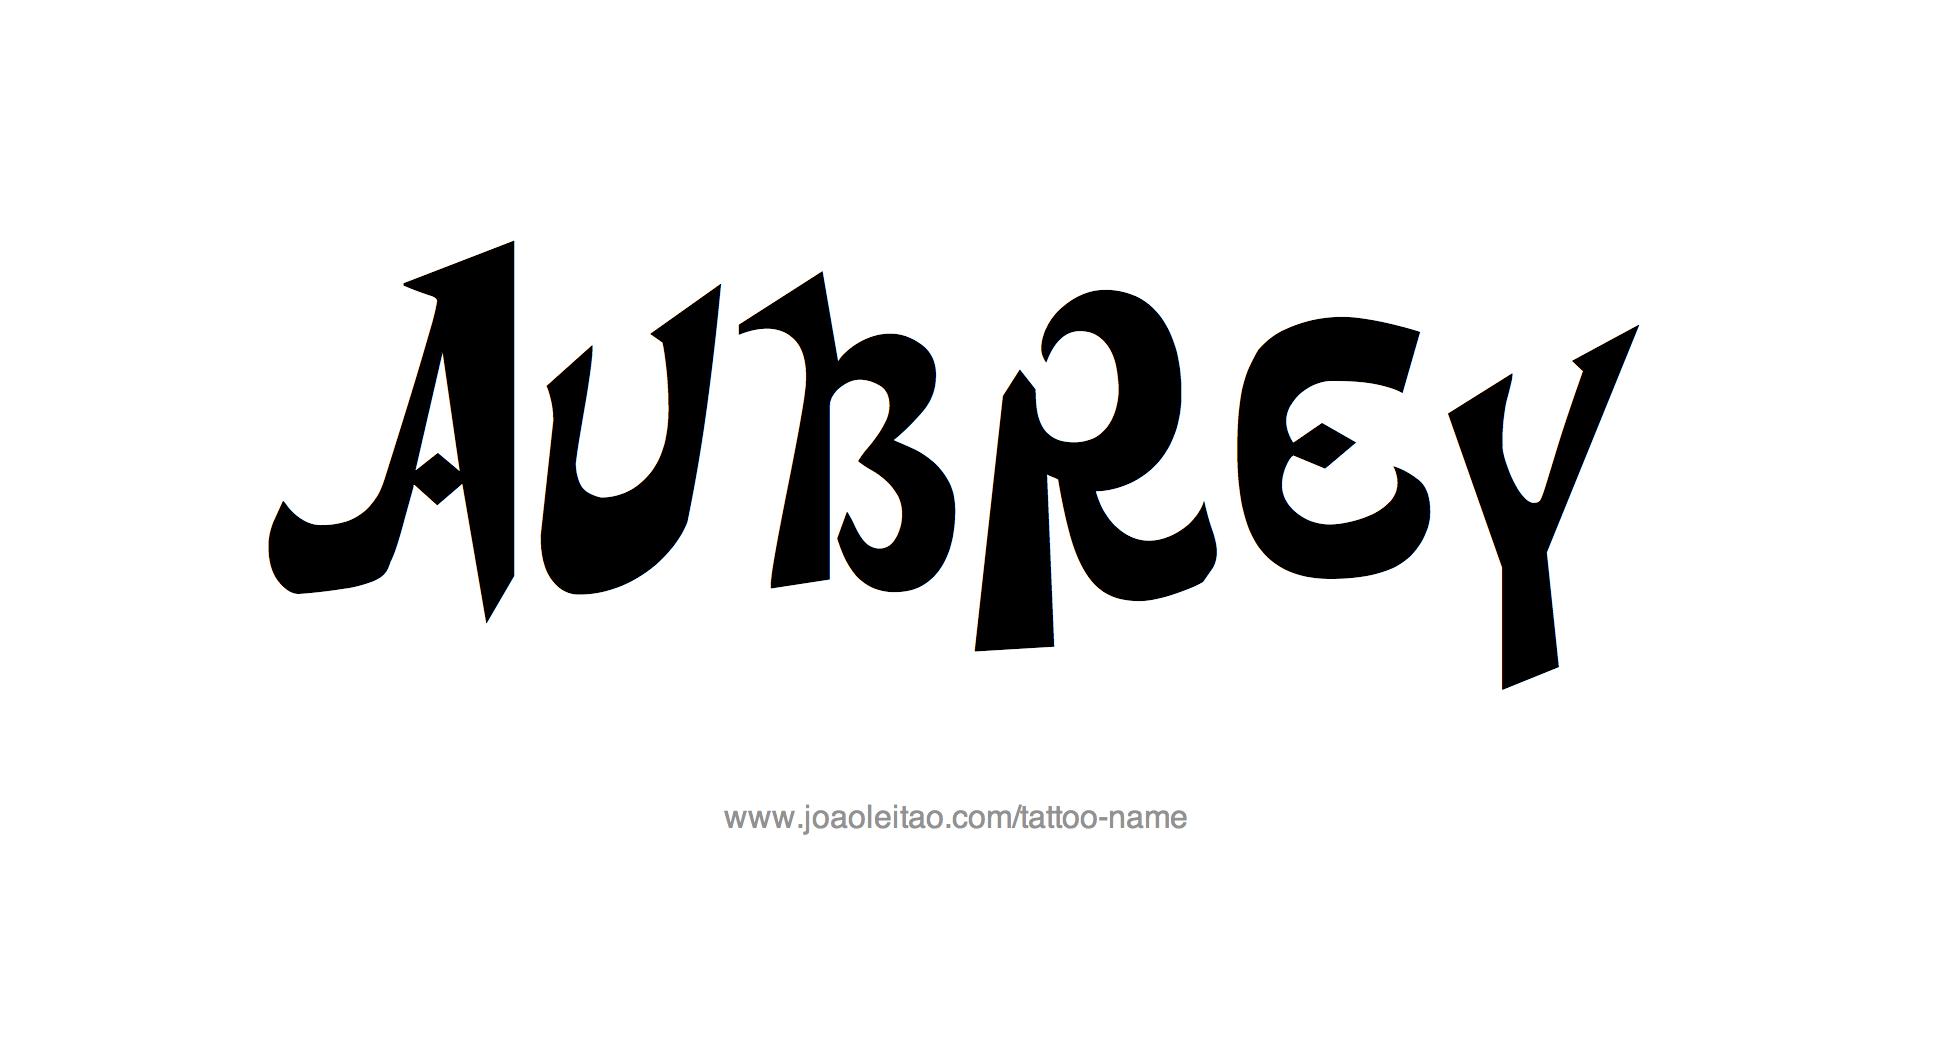 Tattoo Design Name Aubrey